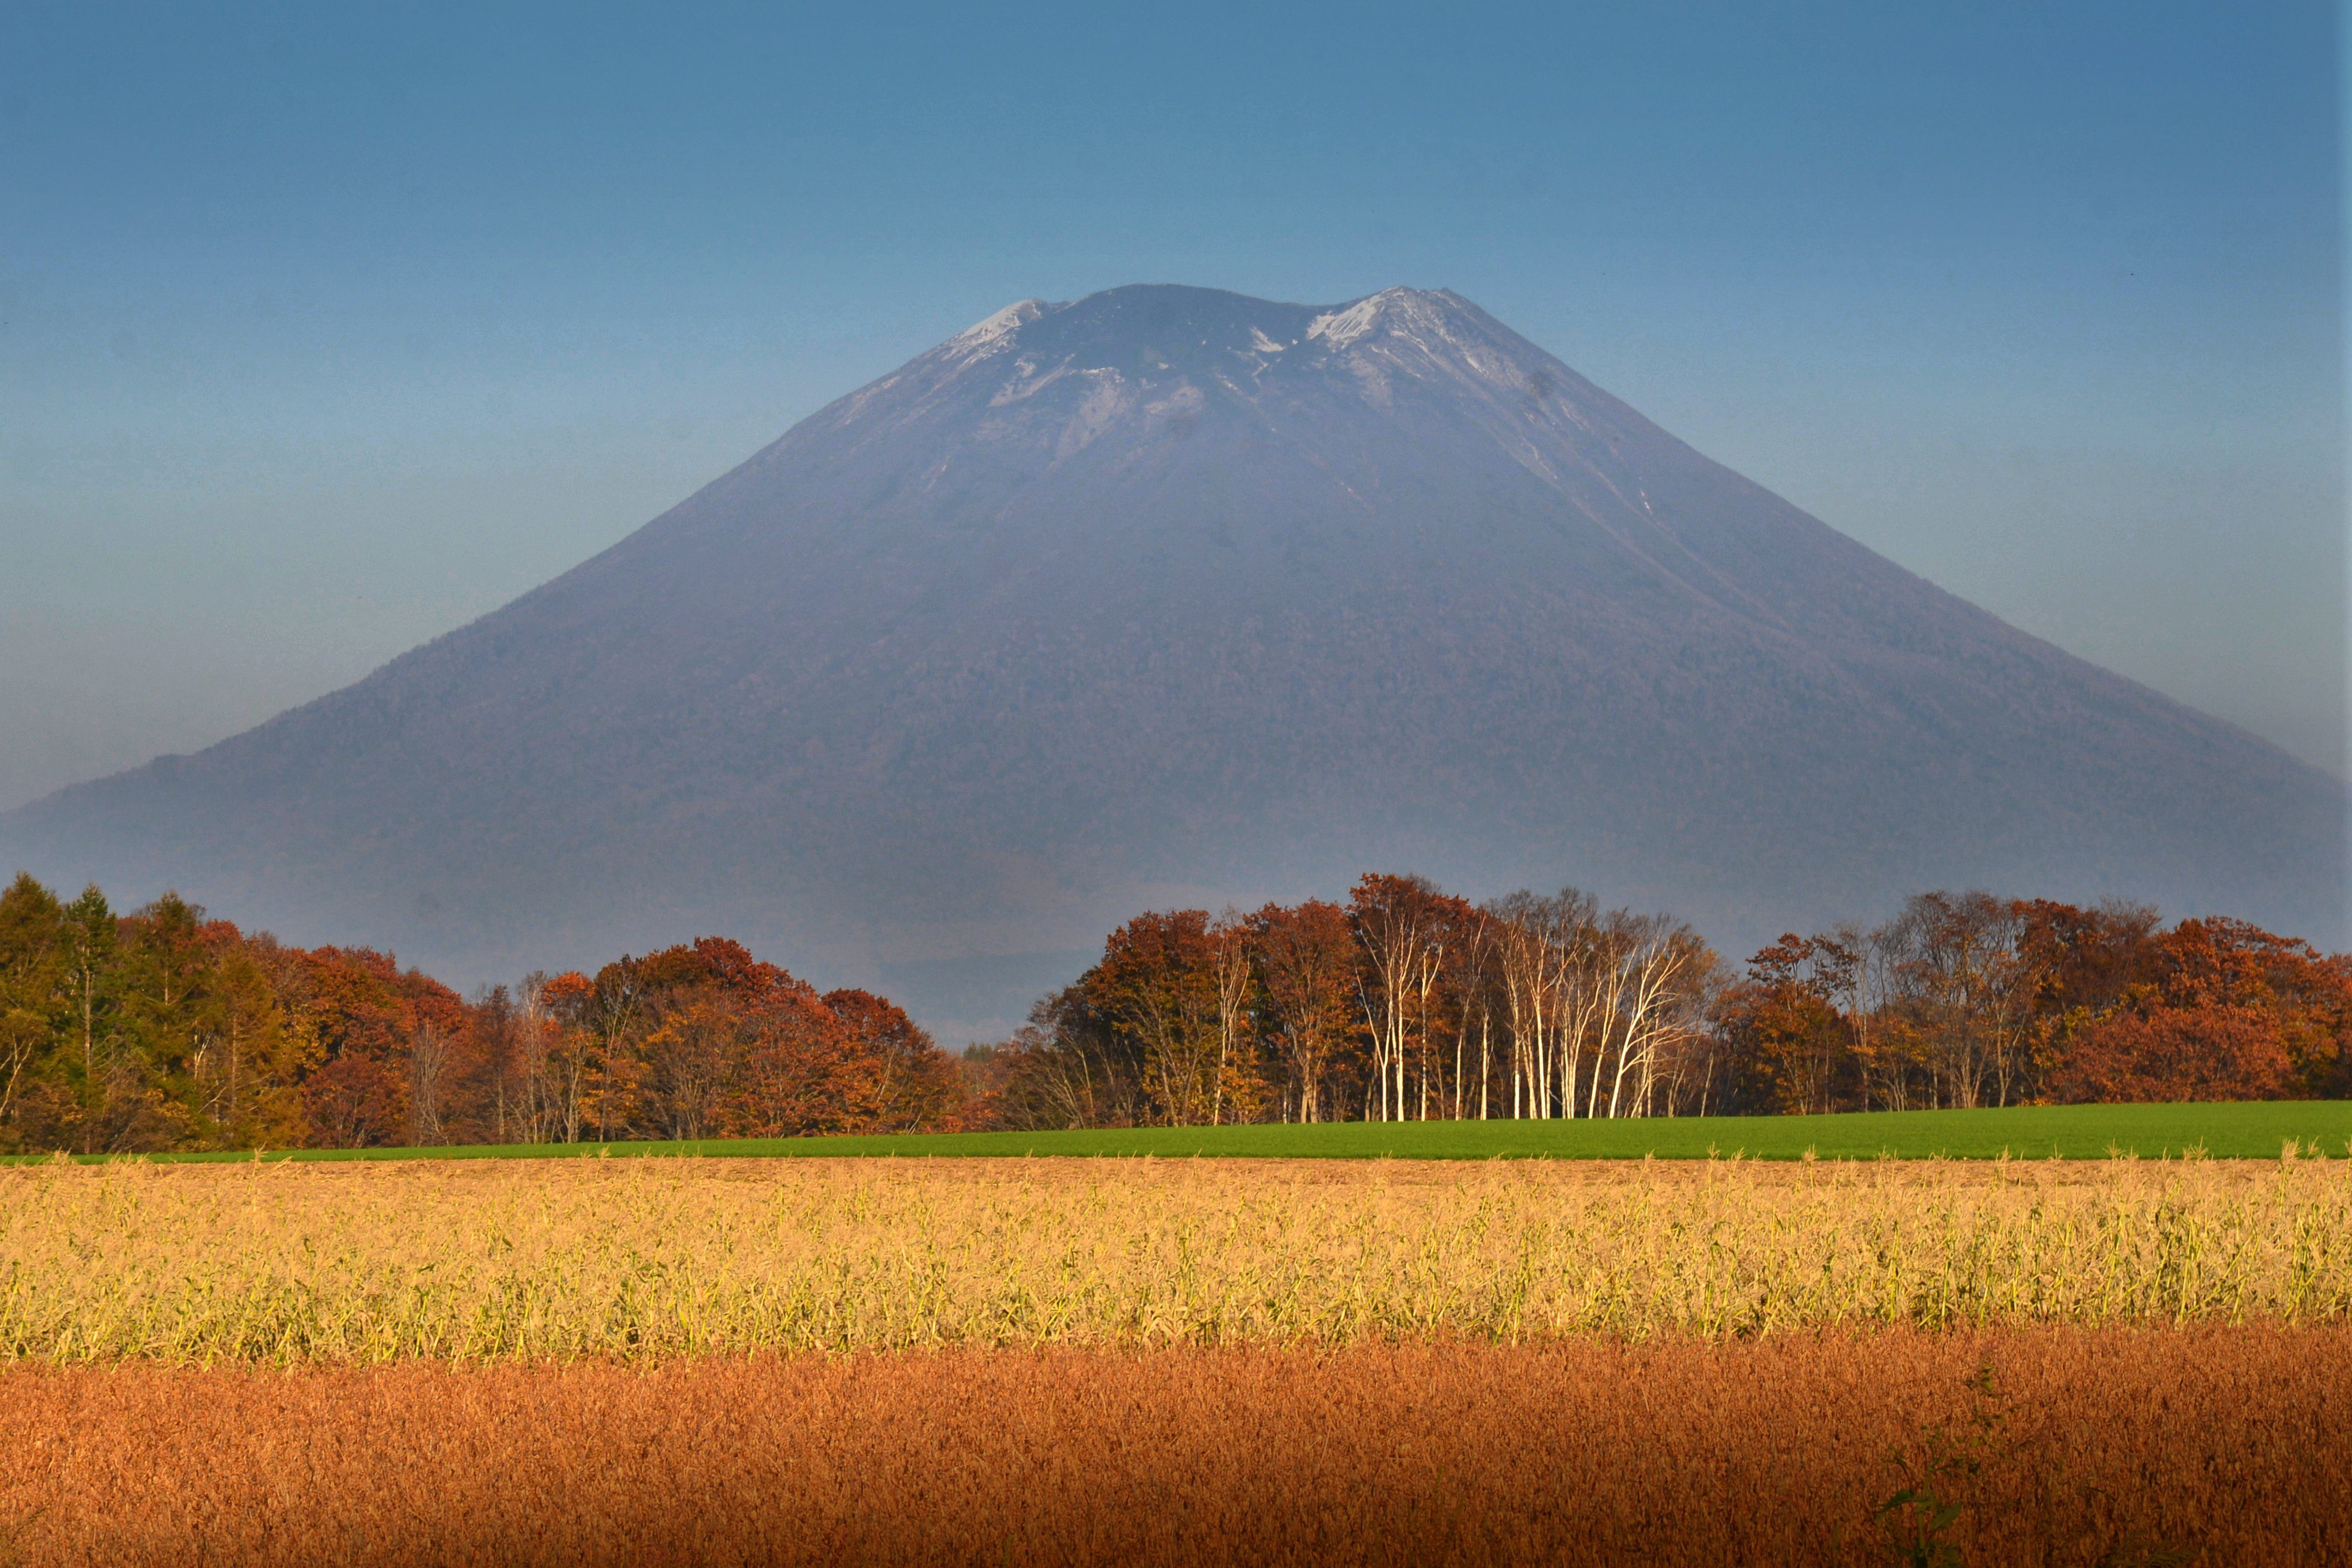 Mt. youtei in Autumn